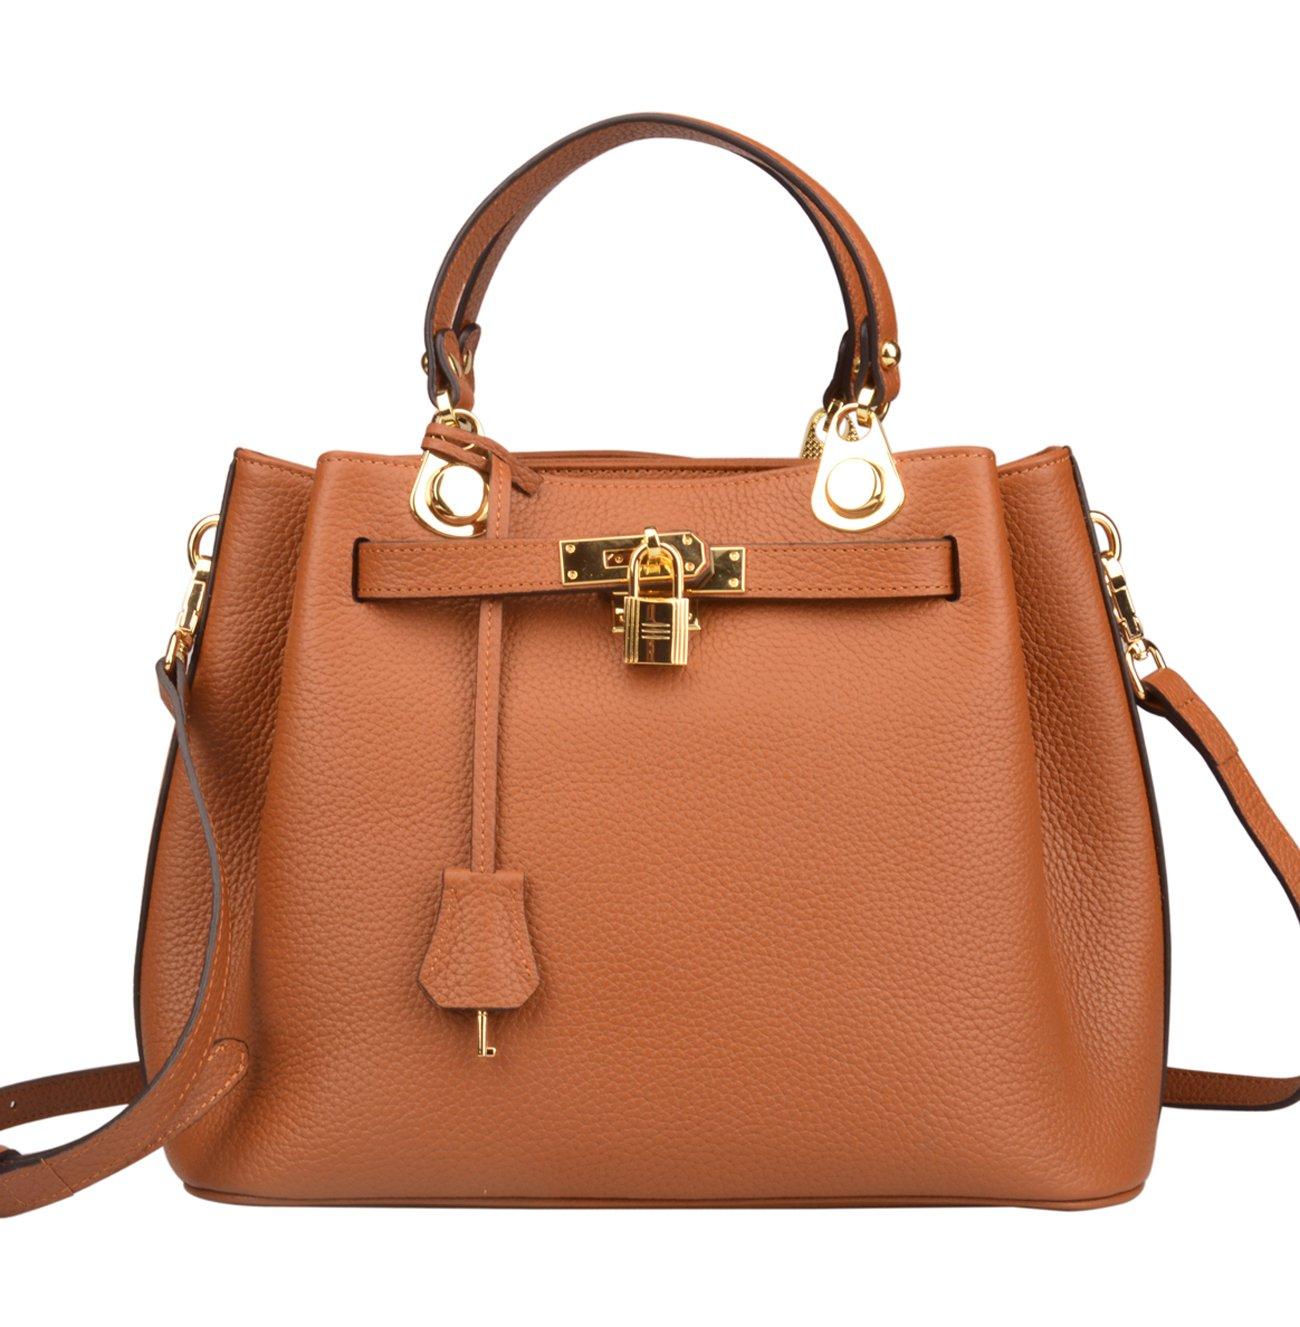 New Arrival Ainifeel Women's Buckle style Padlock Genuine Leather Top Handle Purse Shoulder Handbag Crossbody (Brown)